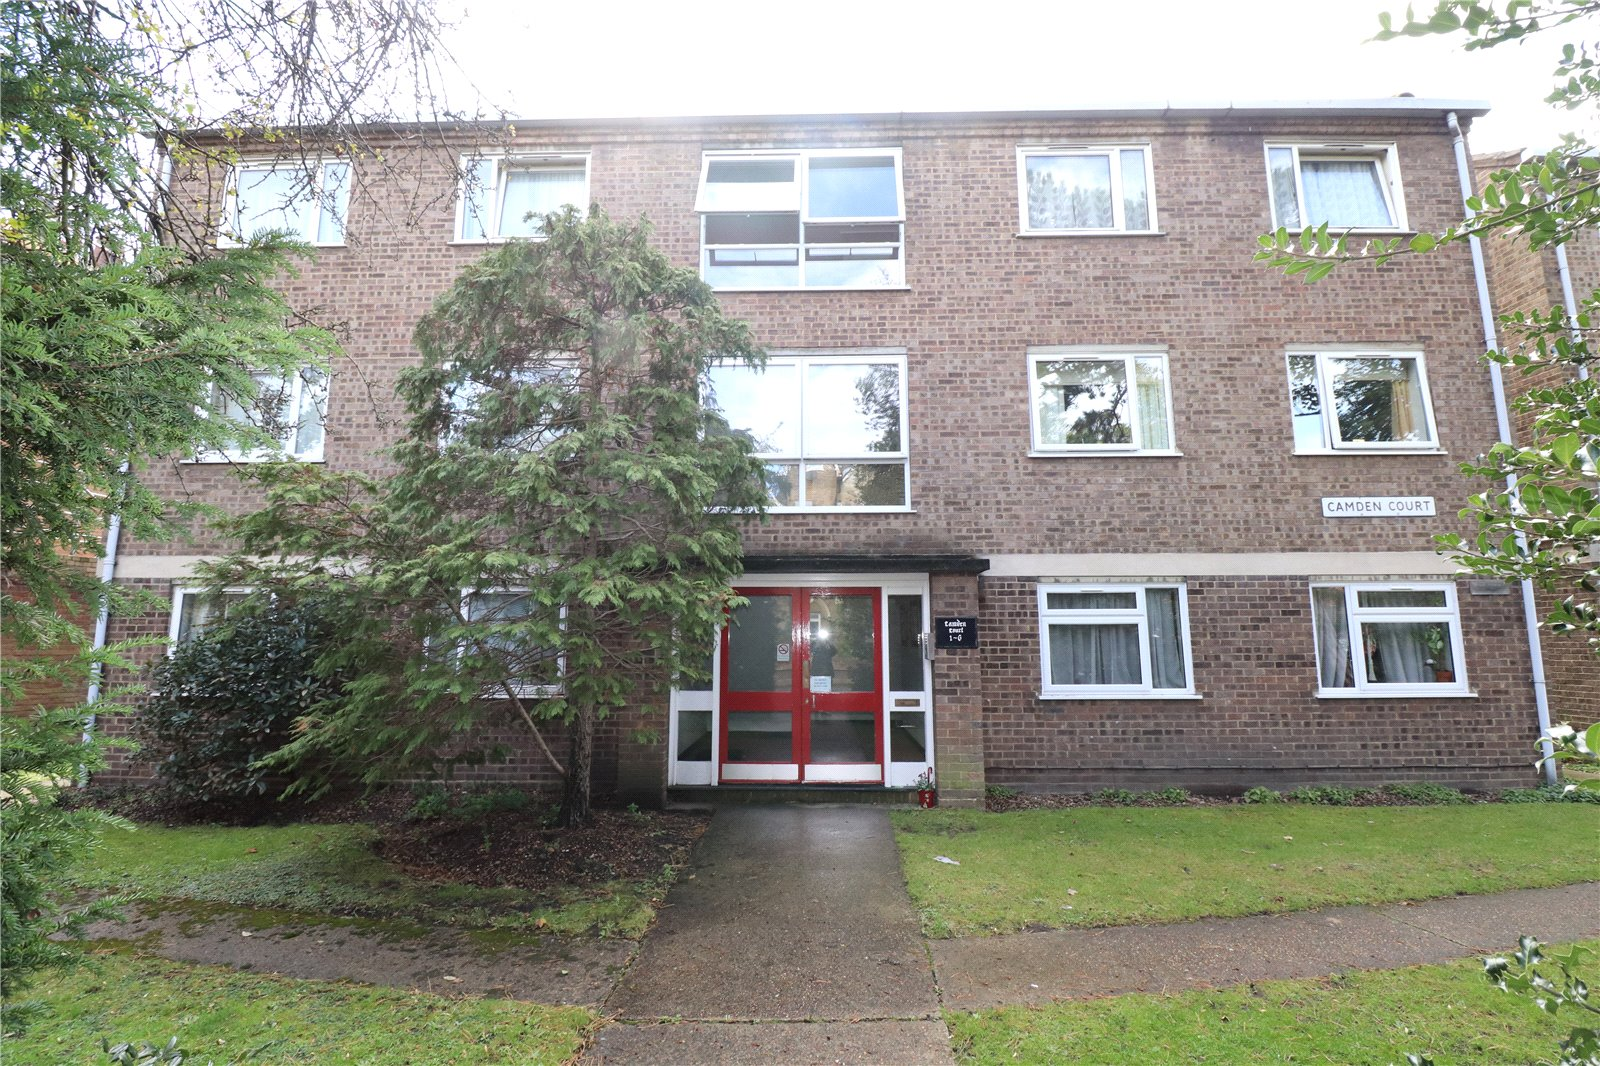 Camden Court, Woolwich Road, Belvedere, Kent, DA17